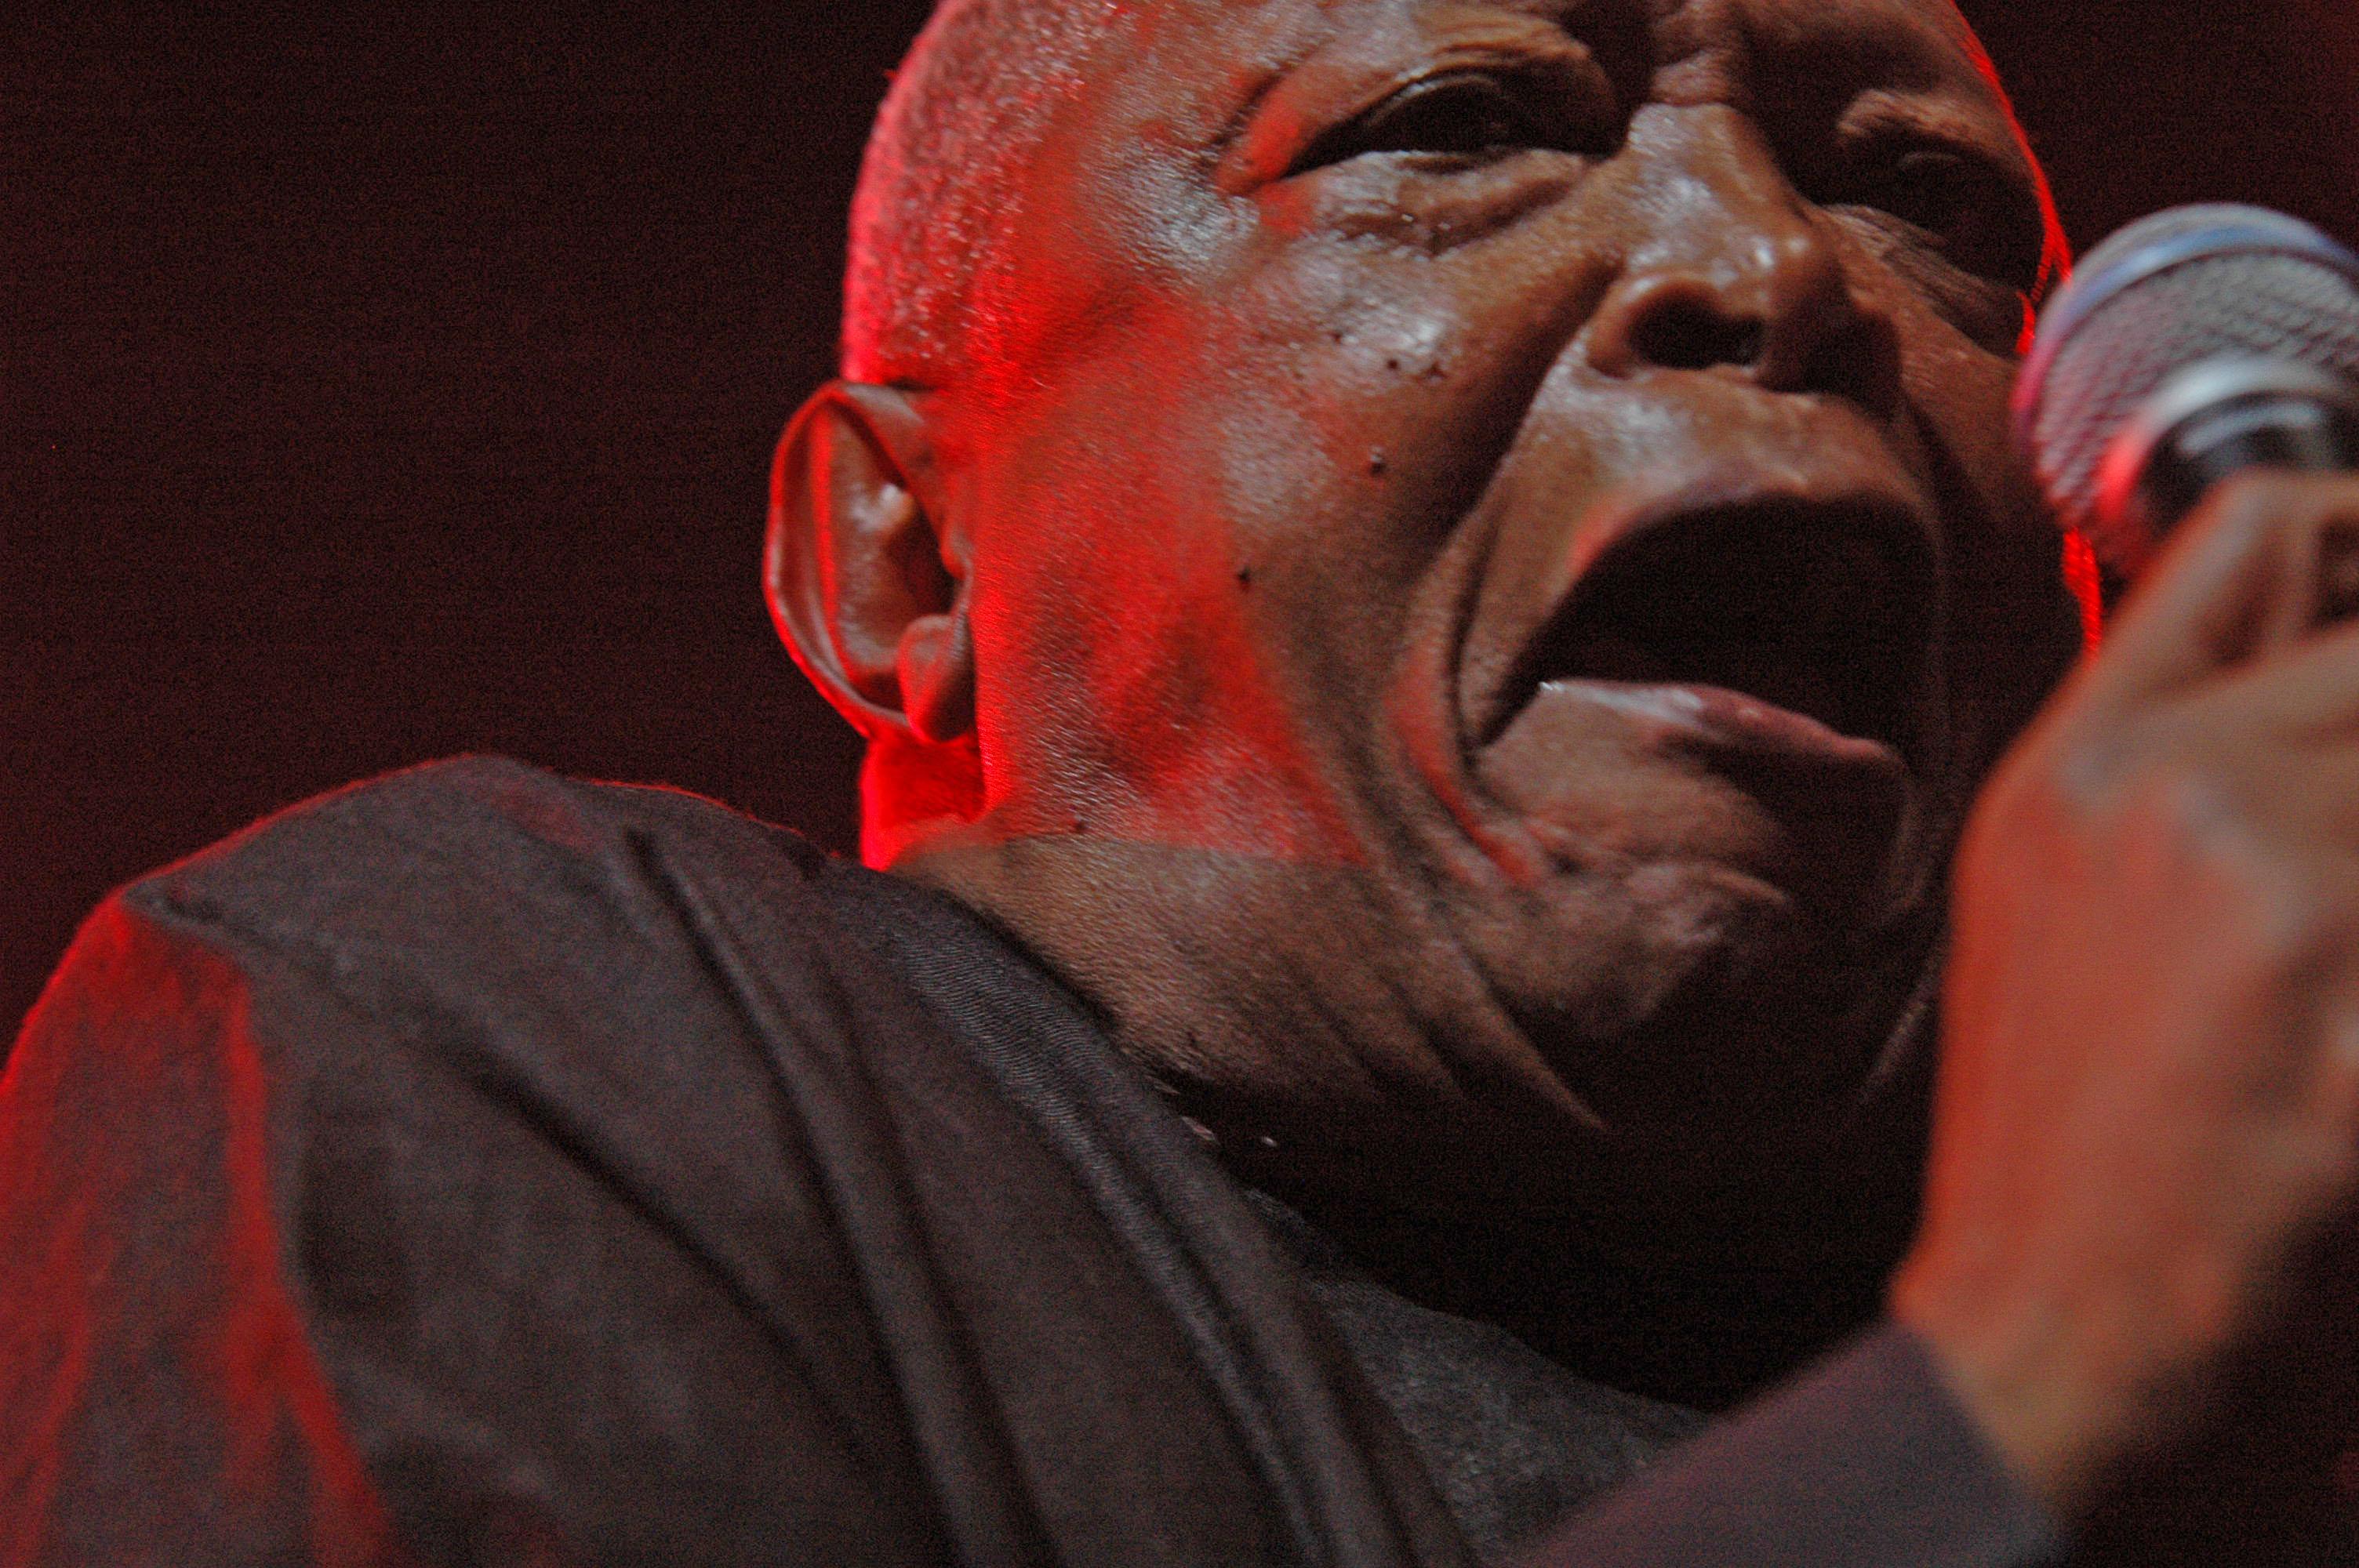 Hugh Masekela, Cape Town Jazz Festival 2012